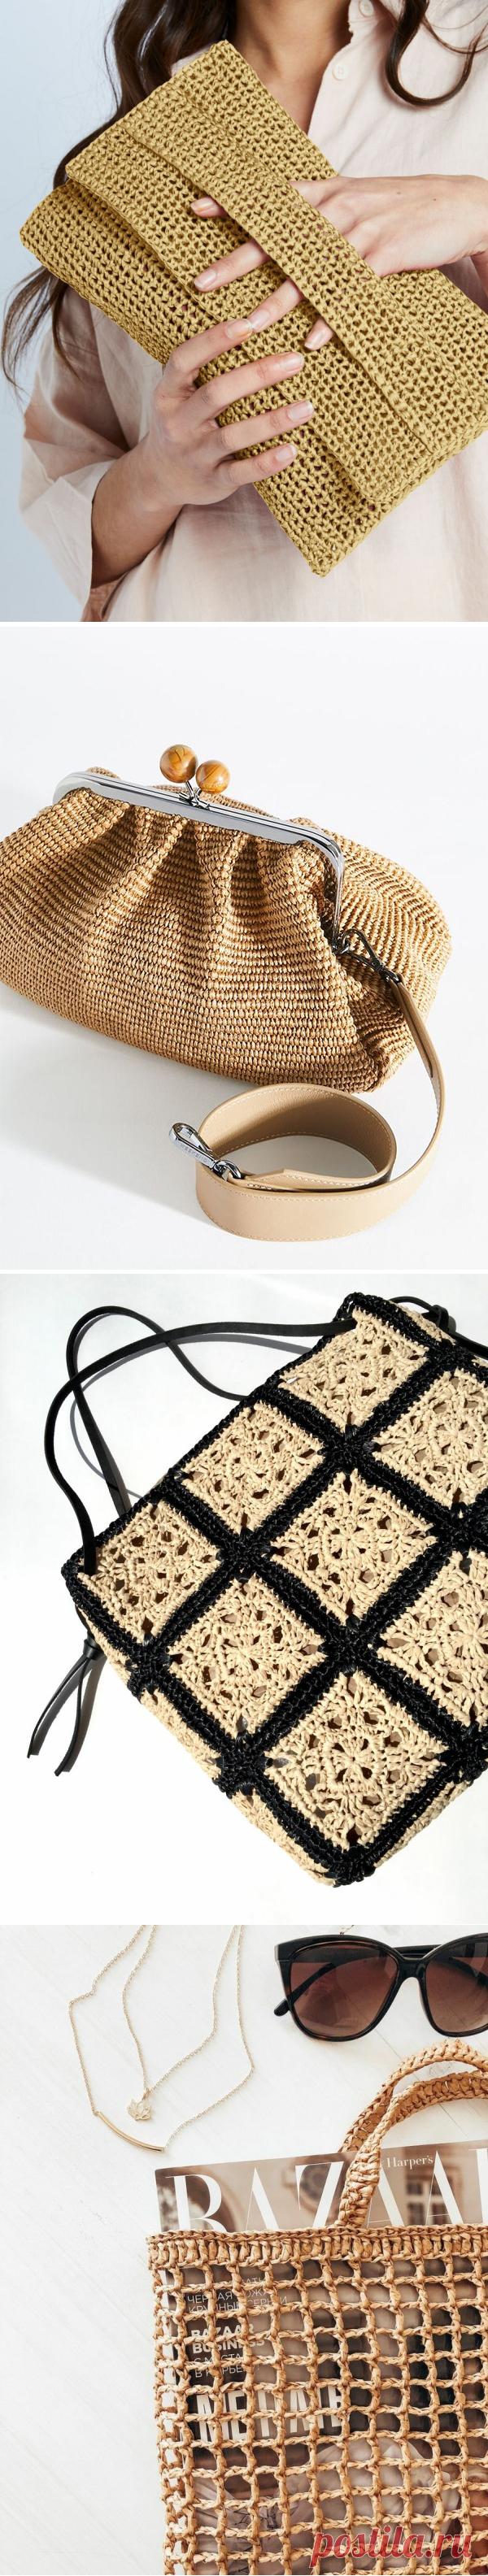 Вдохновляемся и вяжем: сумки из рафии   Anna Kuznetsova Knitting   Яндекс Дзен